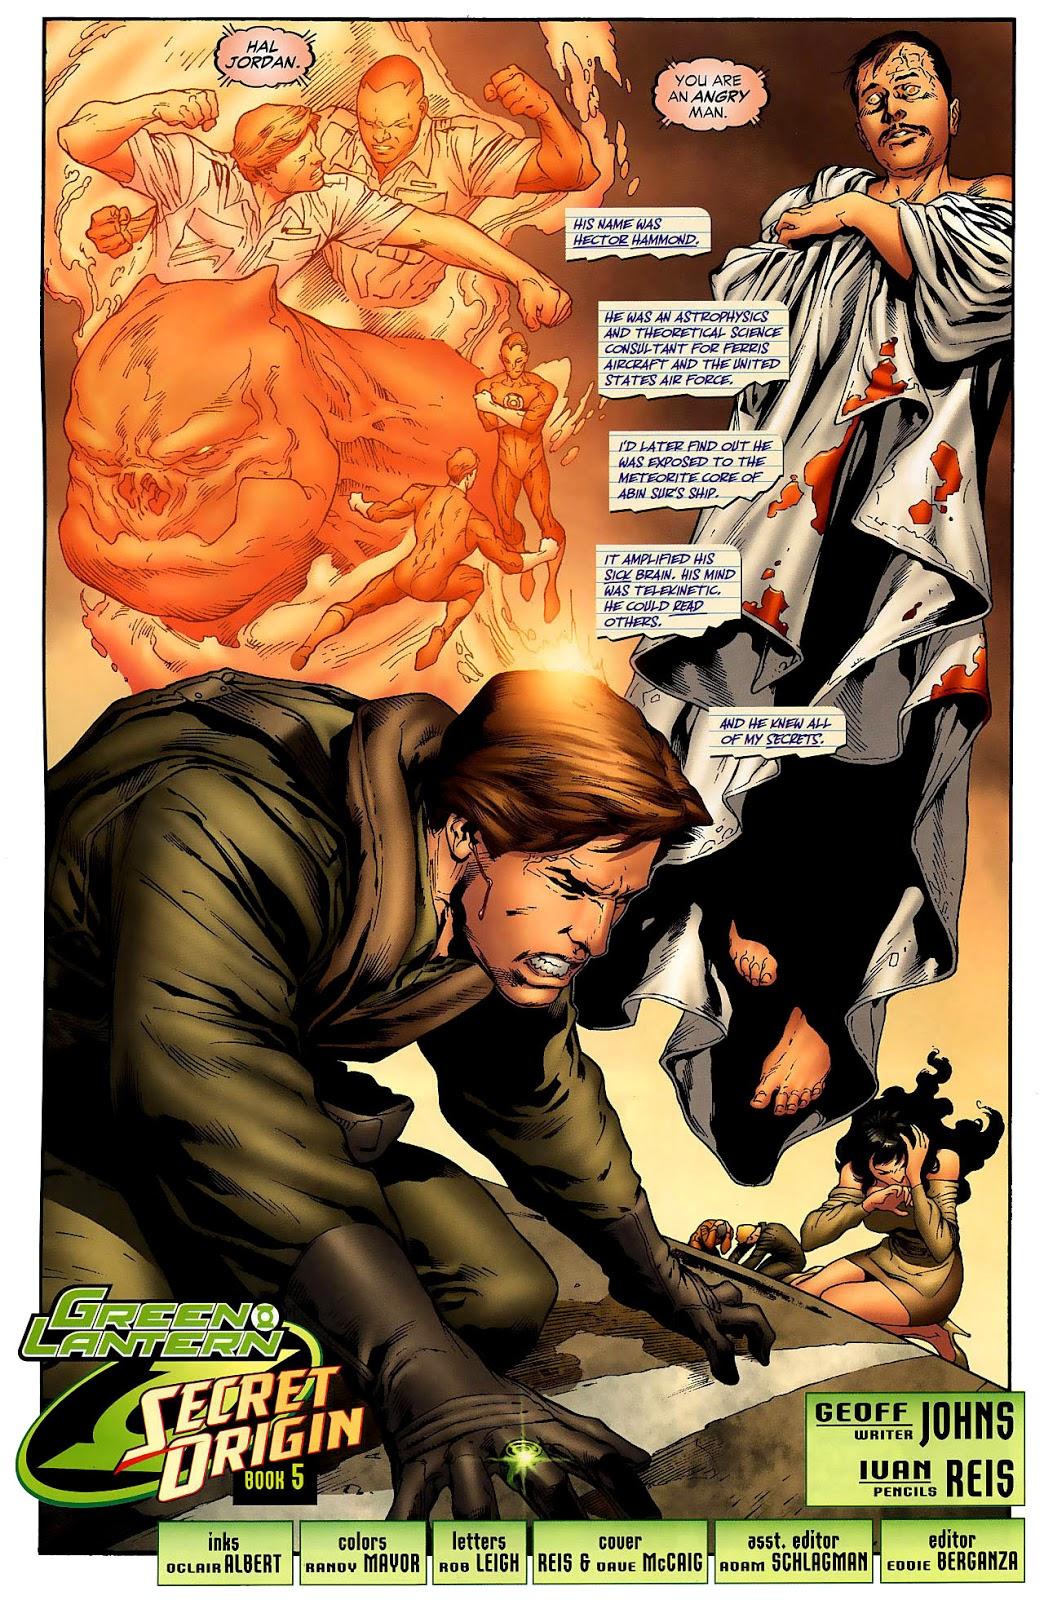 Hector Hammond (Green Lantern Vol. 4 #33)